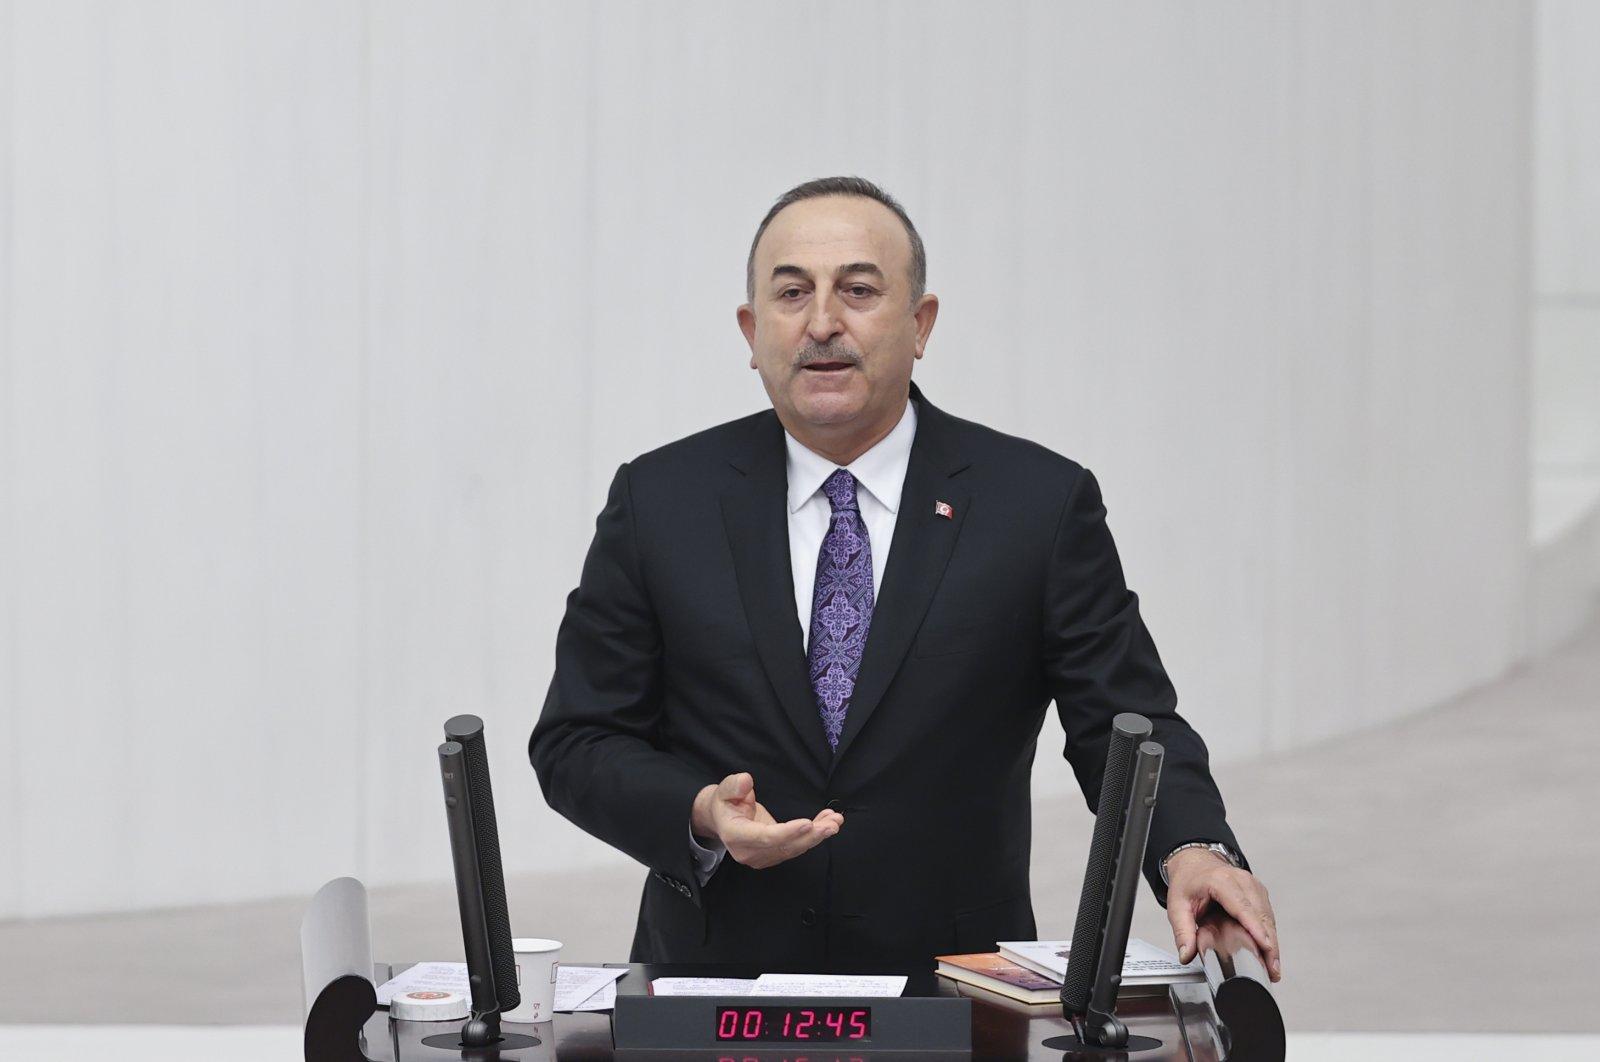 Foreign Minister Mevlüt Çavuşoğlu speaks at the Turkish Parliament in Ankara, Turkey, Dec. 14, 2020. (AA Photo)